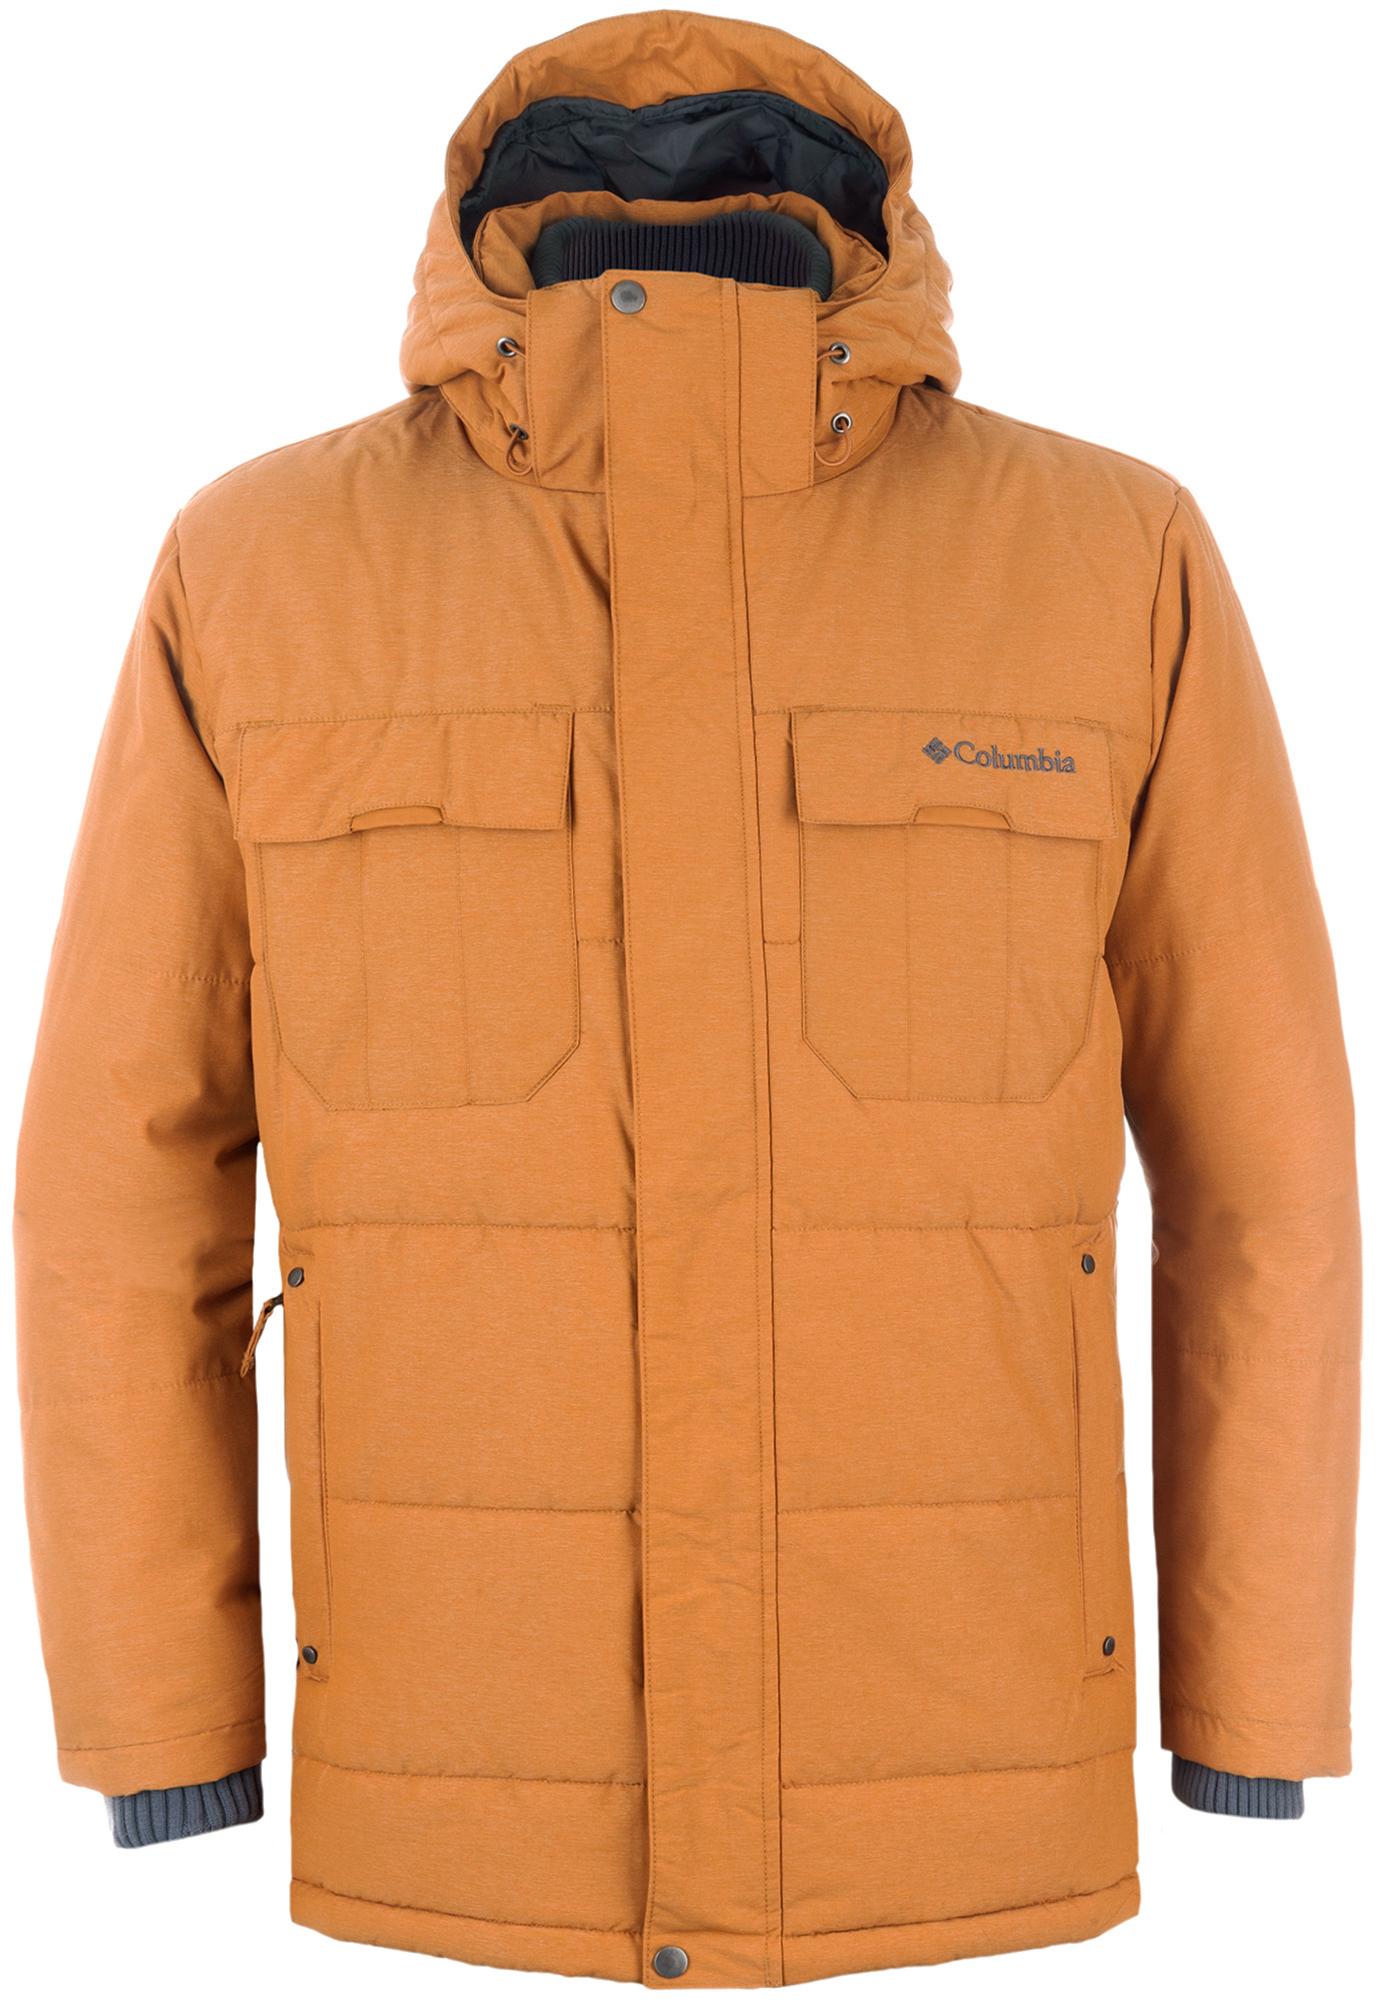 Columbia Куртка утепленная мужская Columbia Mount Tabor columbia куртка утепленная мужская columbia maguire place ii